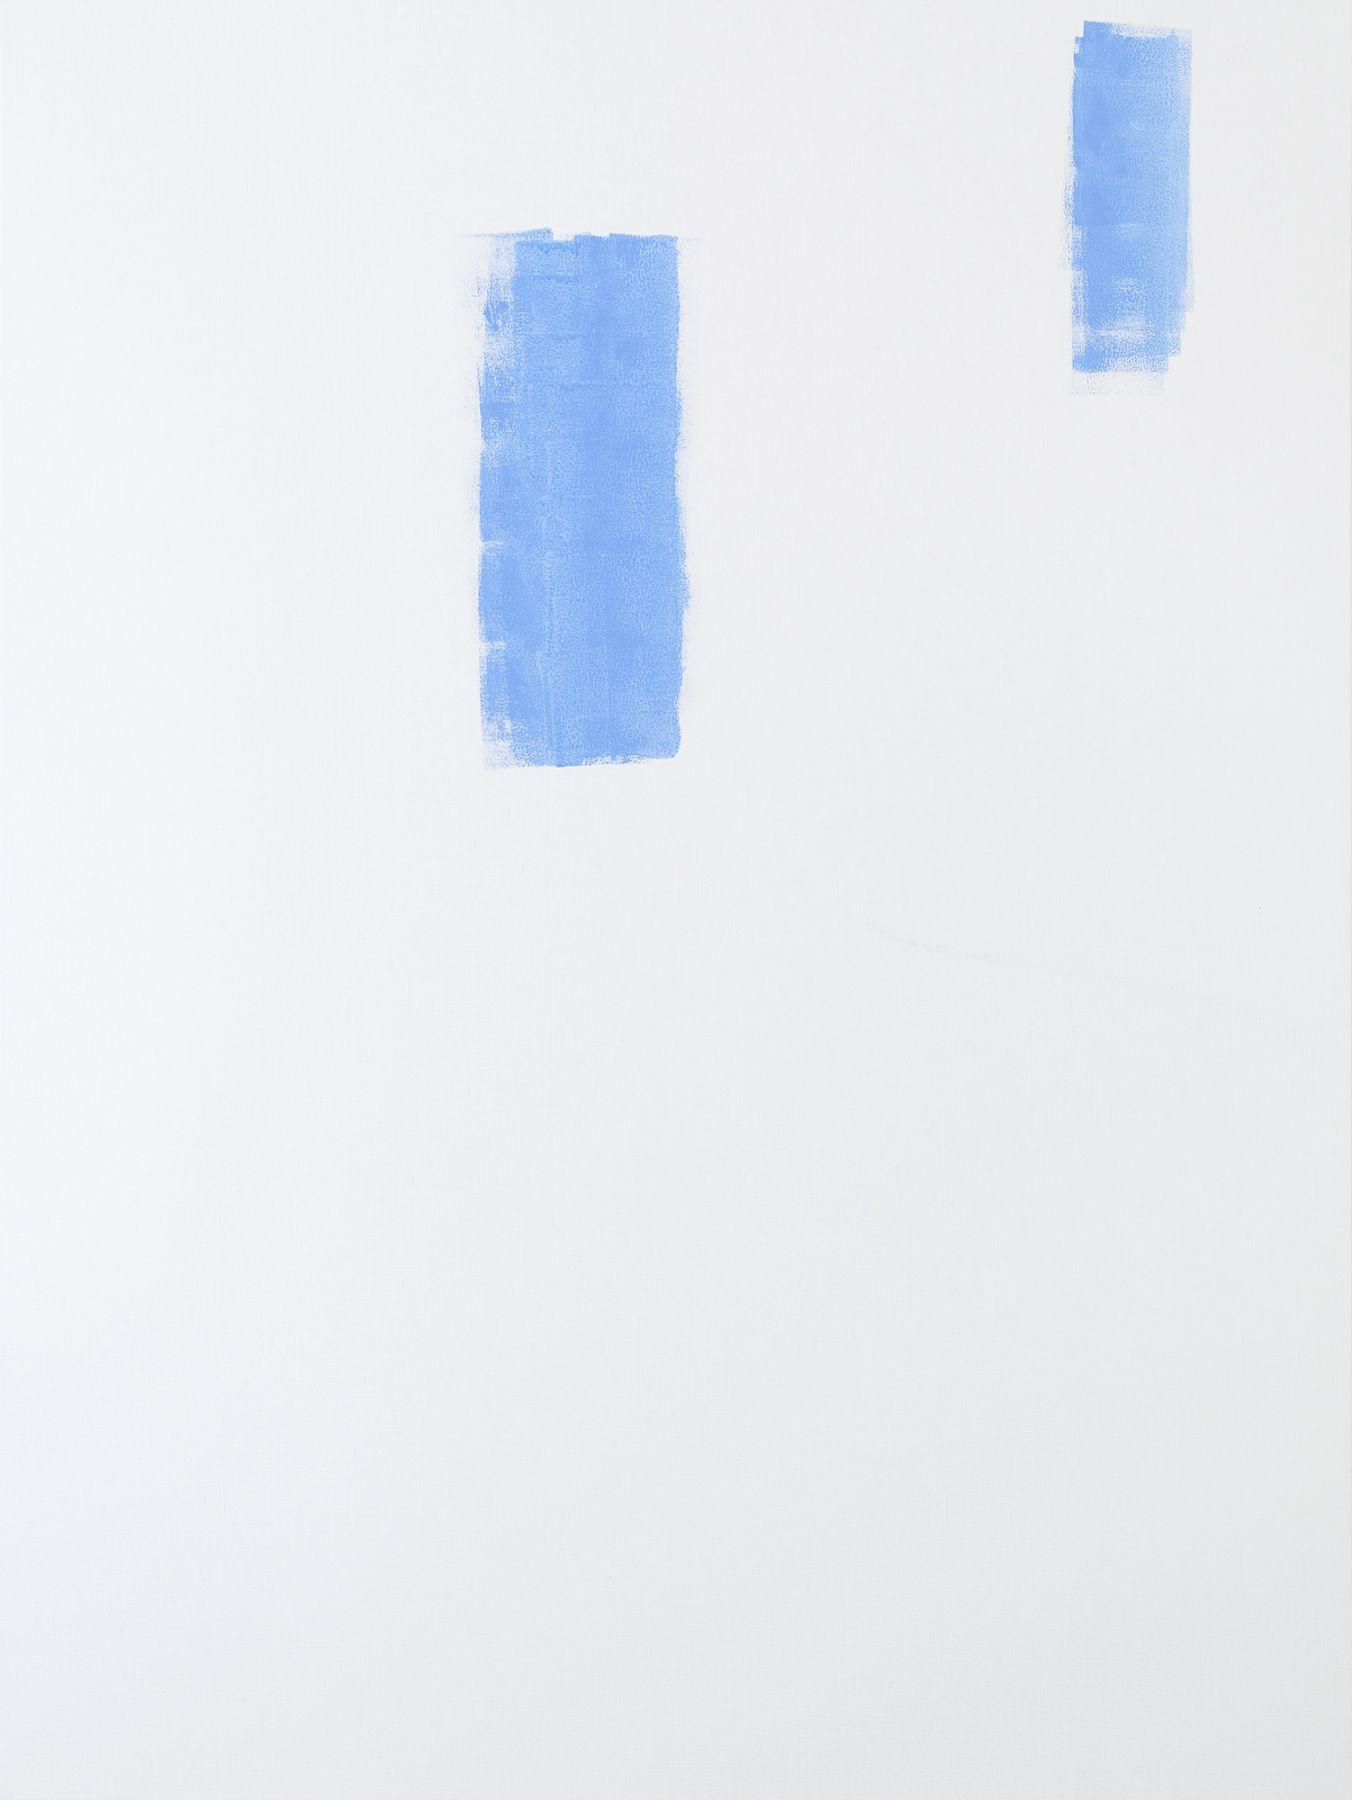 Michael Krebber MK.302, 2015 Acrylic on canvas  78 3/4 x 59 1/8 inches (200 x 150.2 cm)